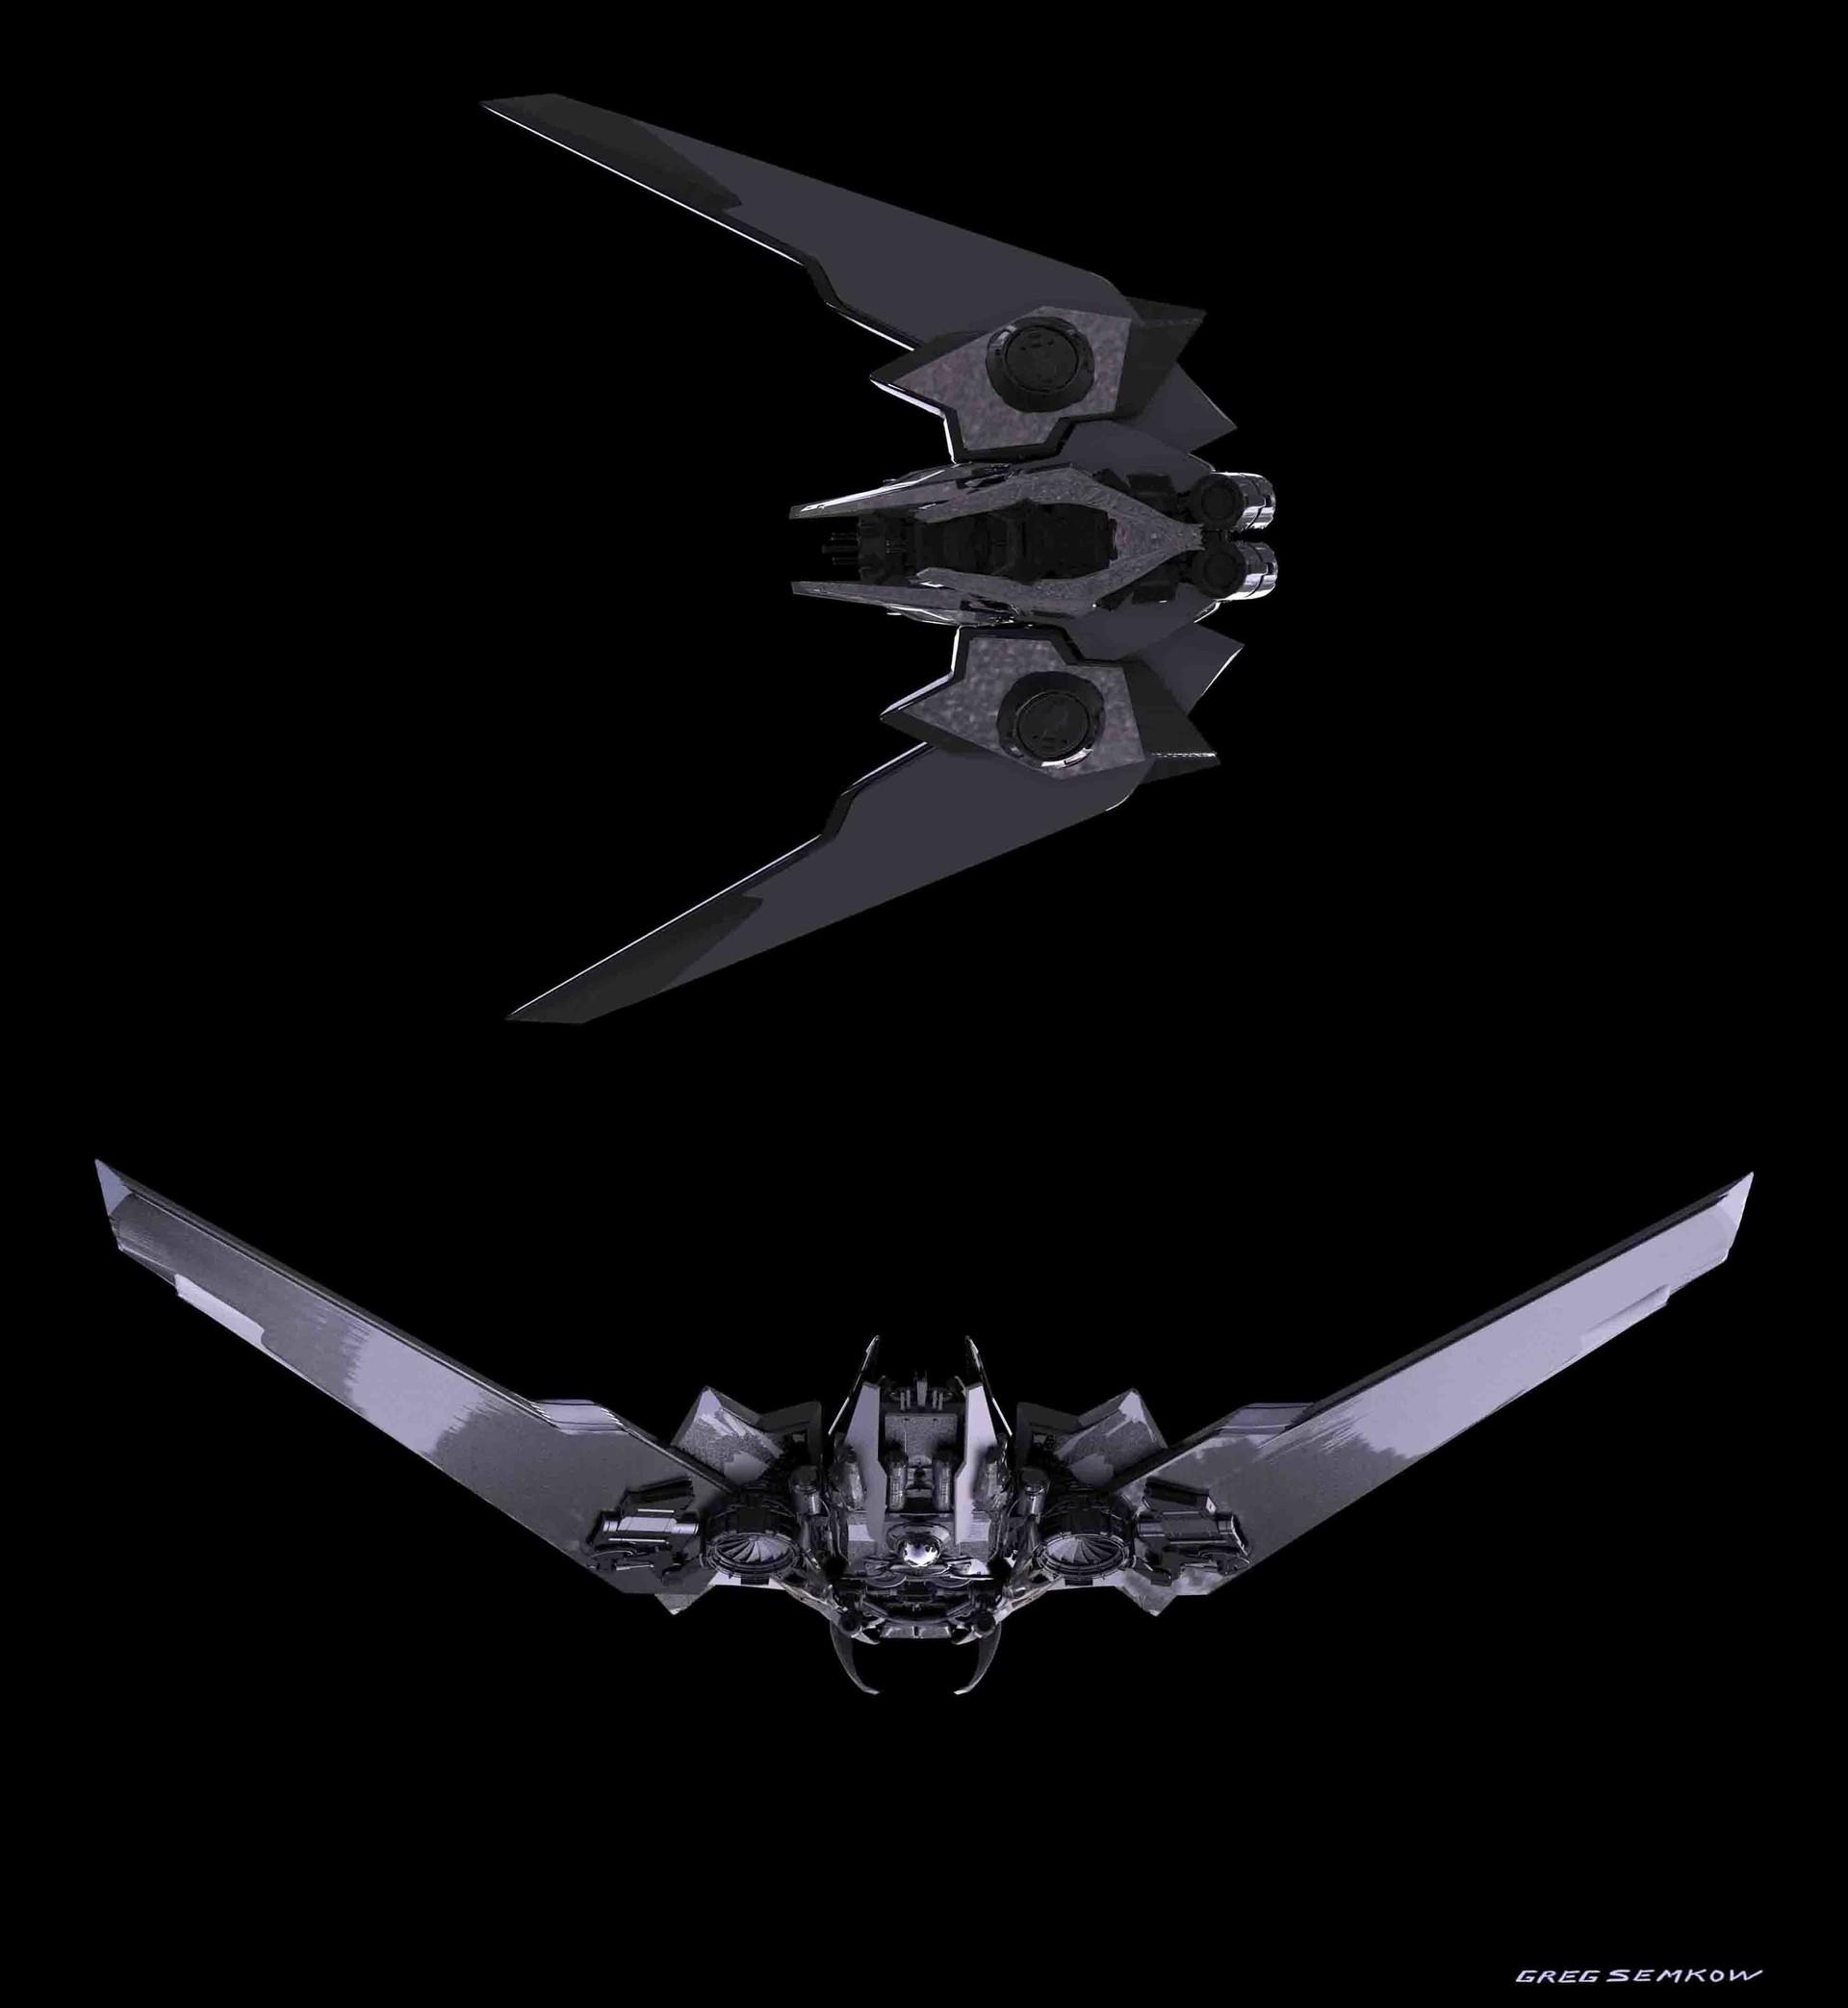 Greg semkow falconer drone orthos